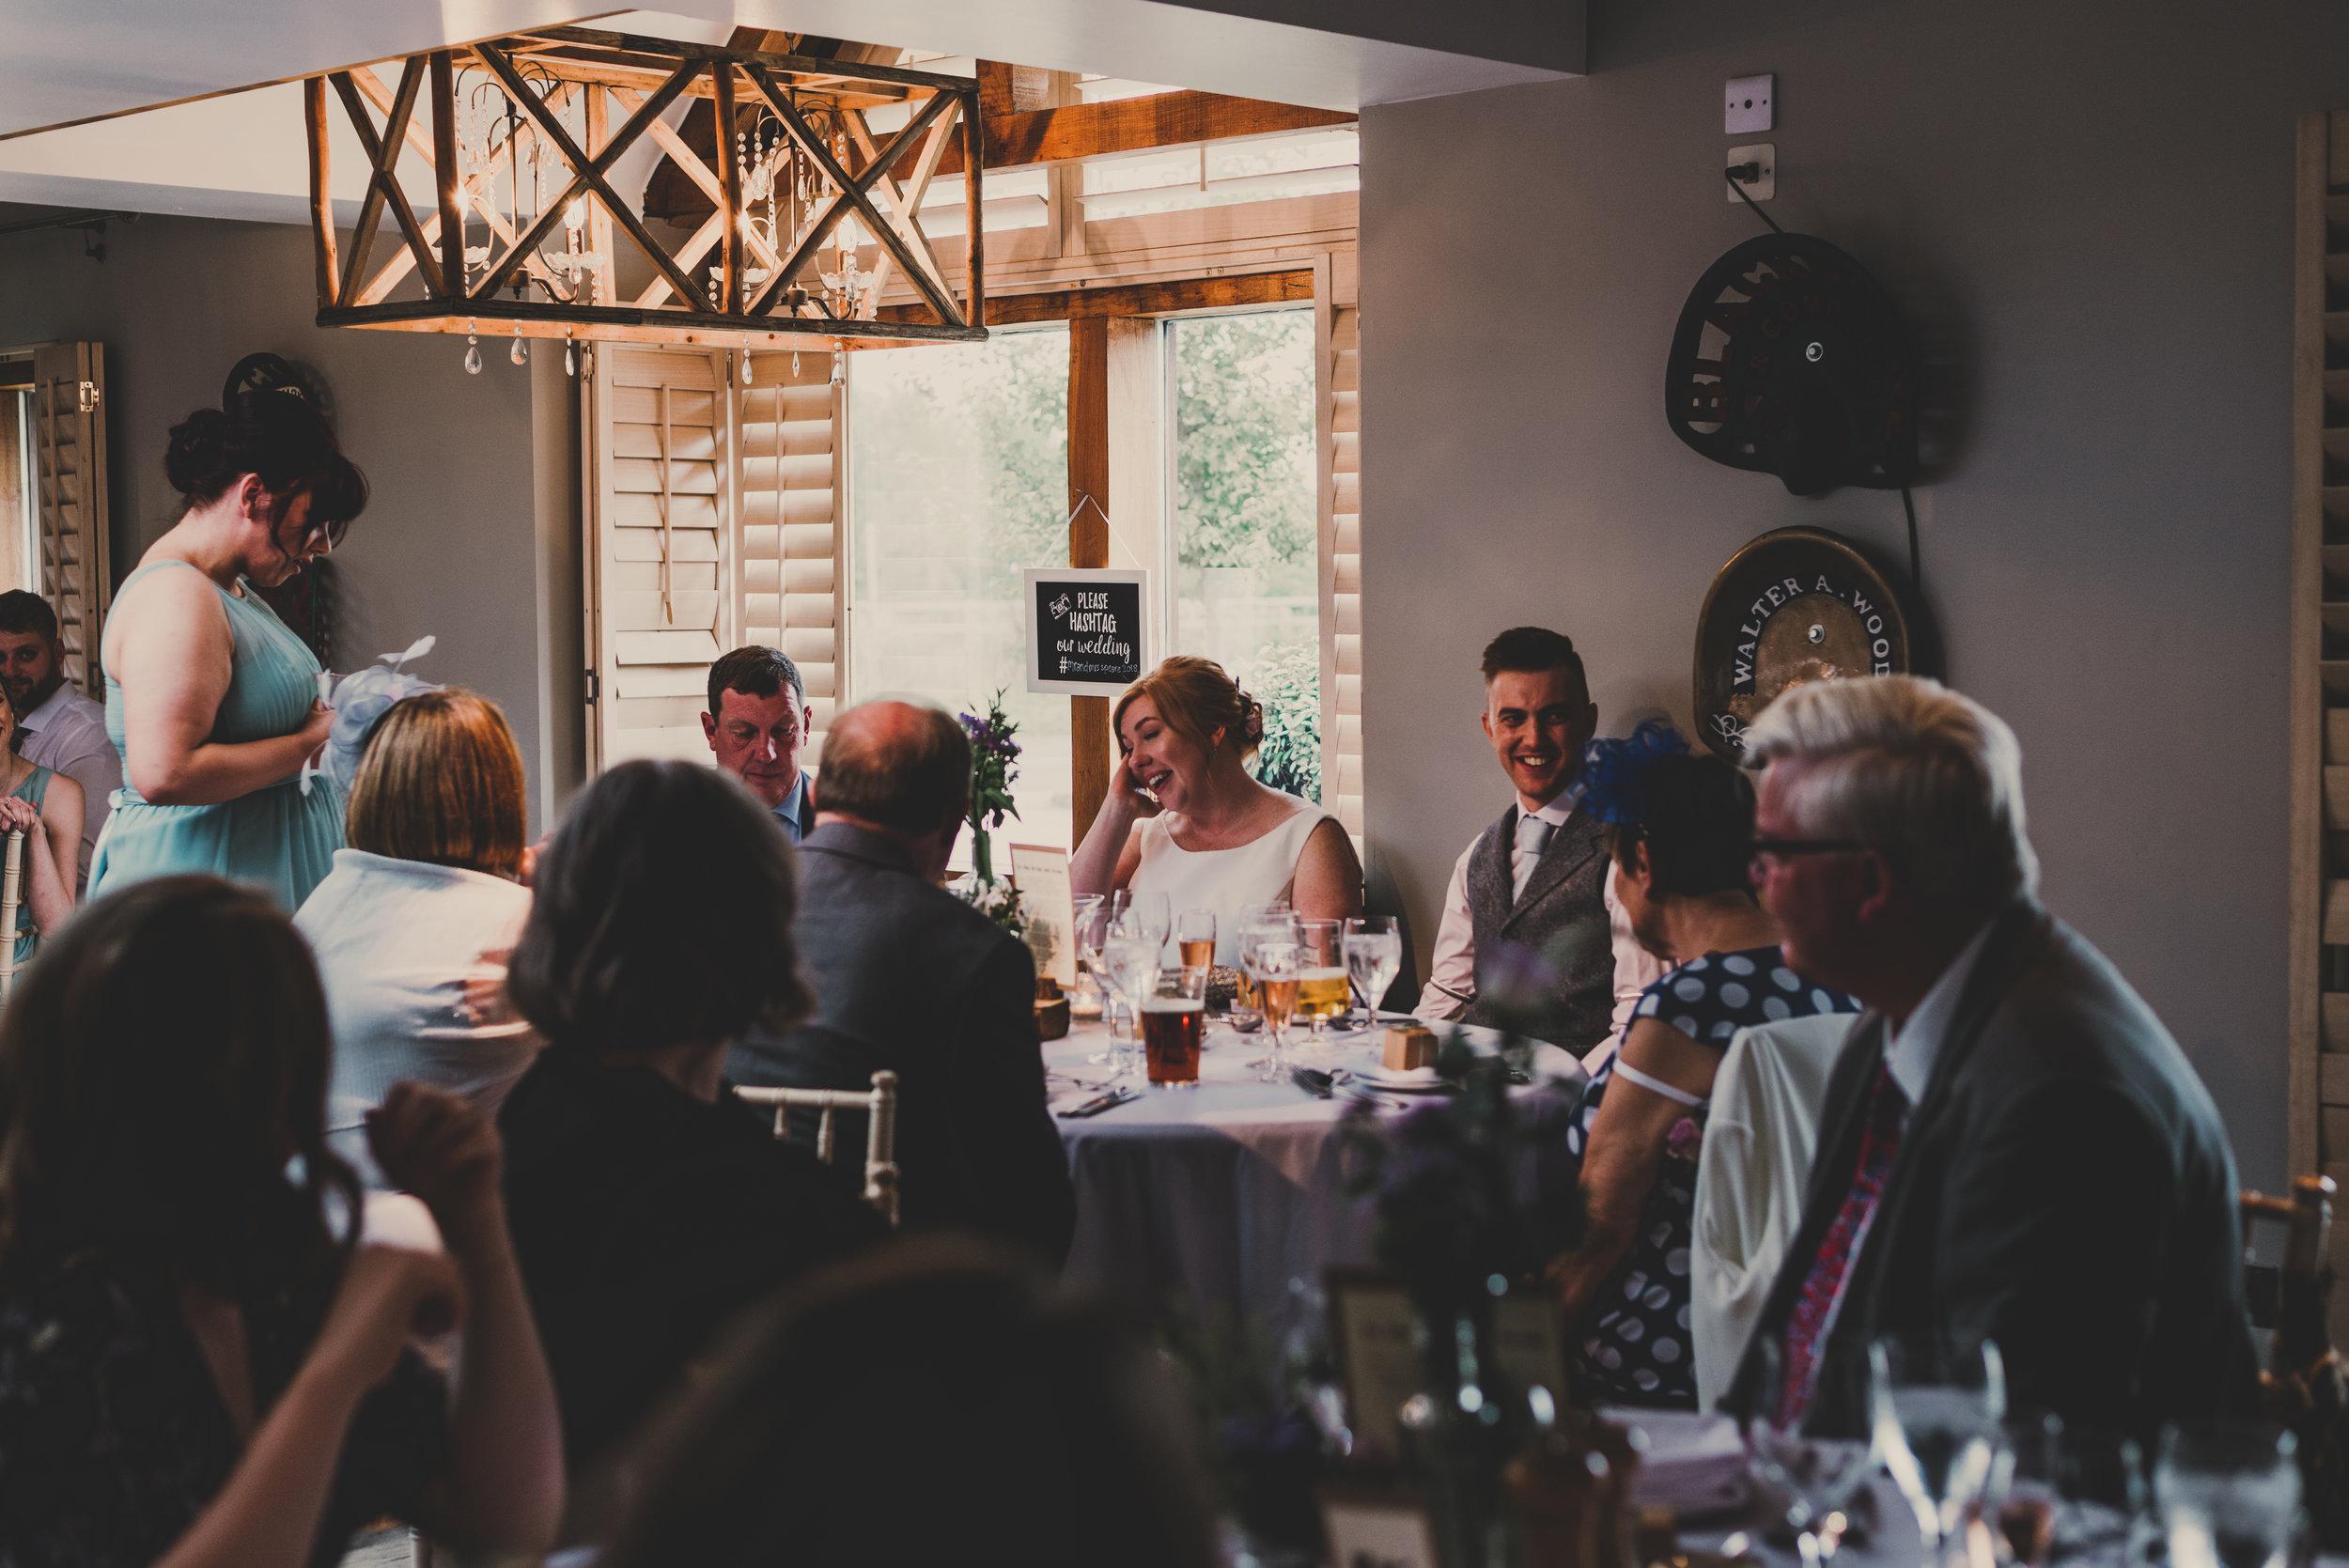 cheshire-alternative-wedding-photography-in-anglesey (13).jpg